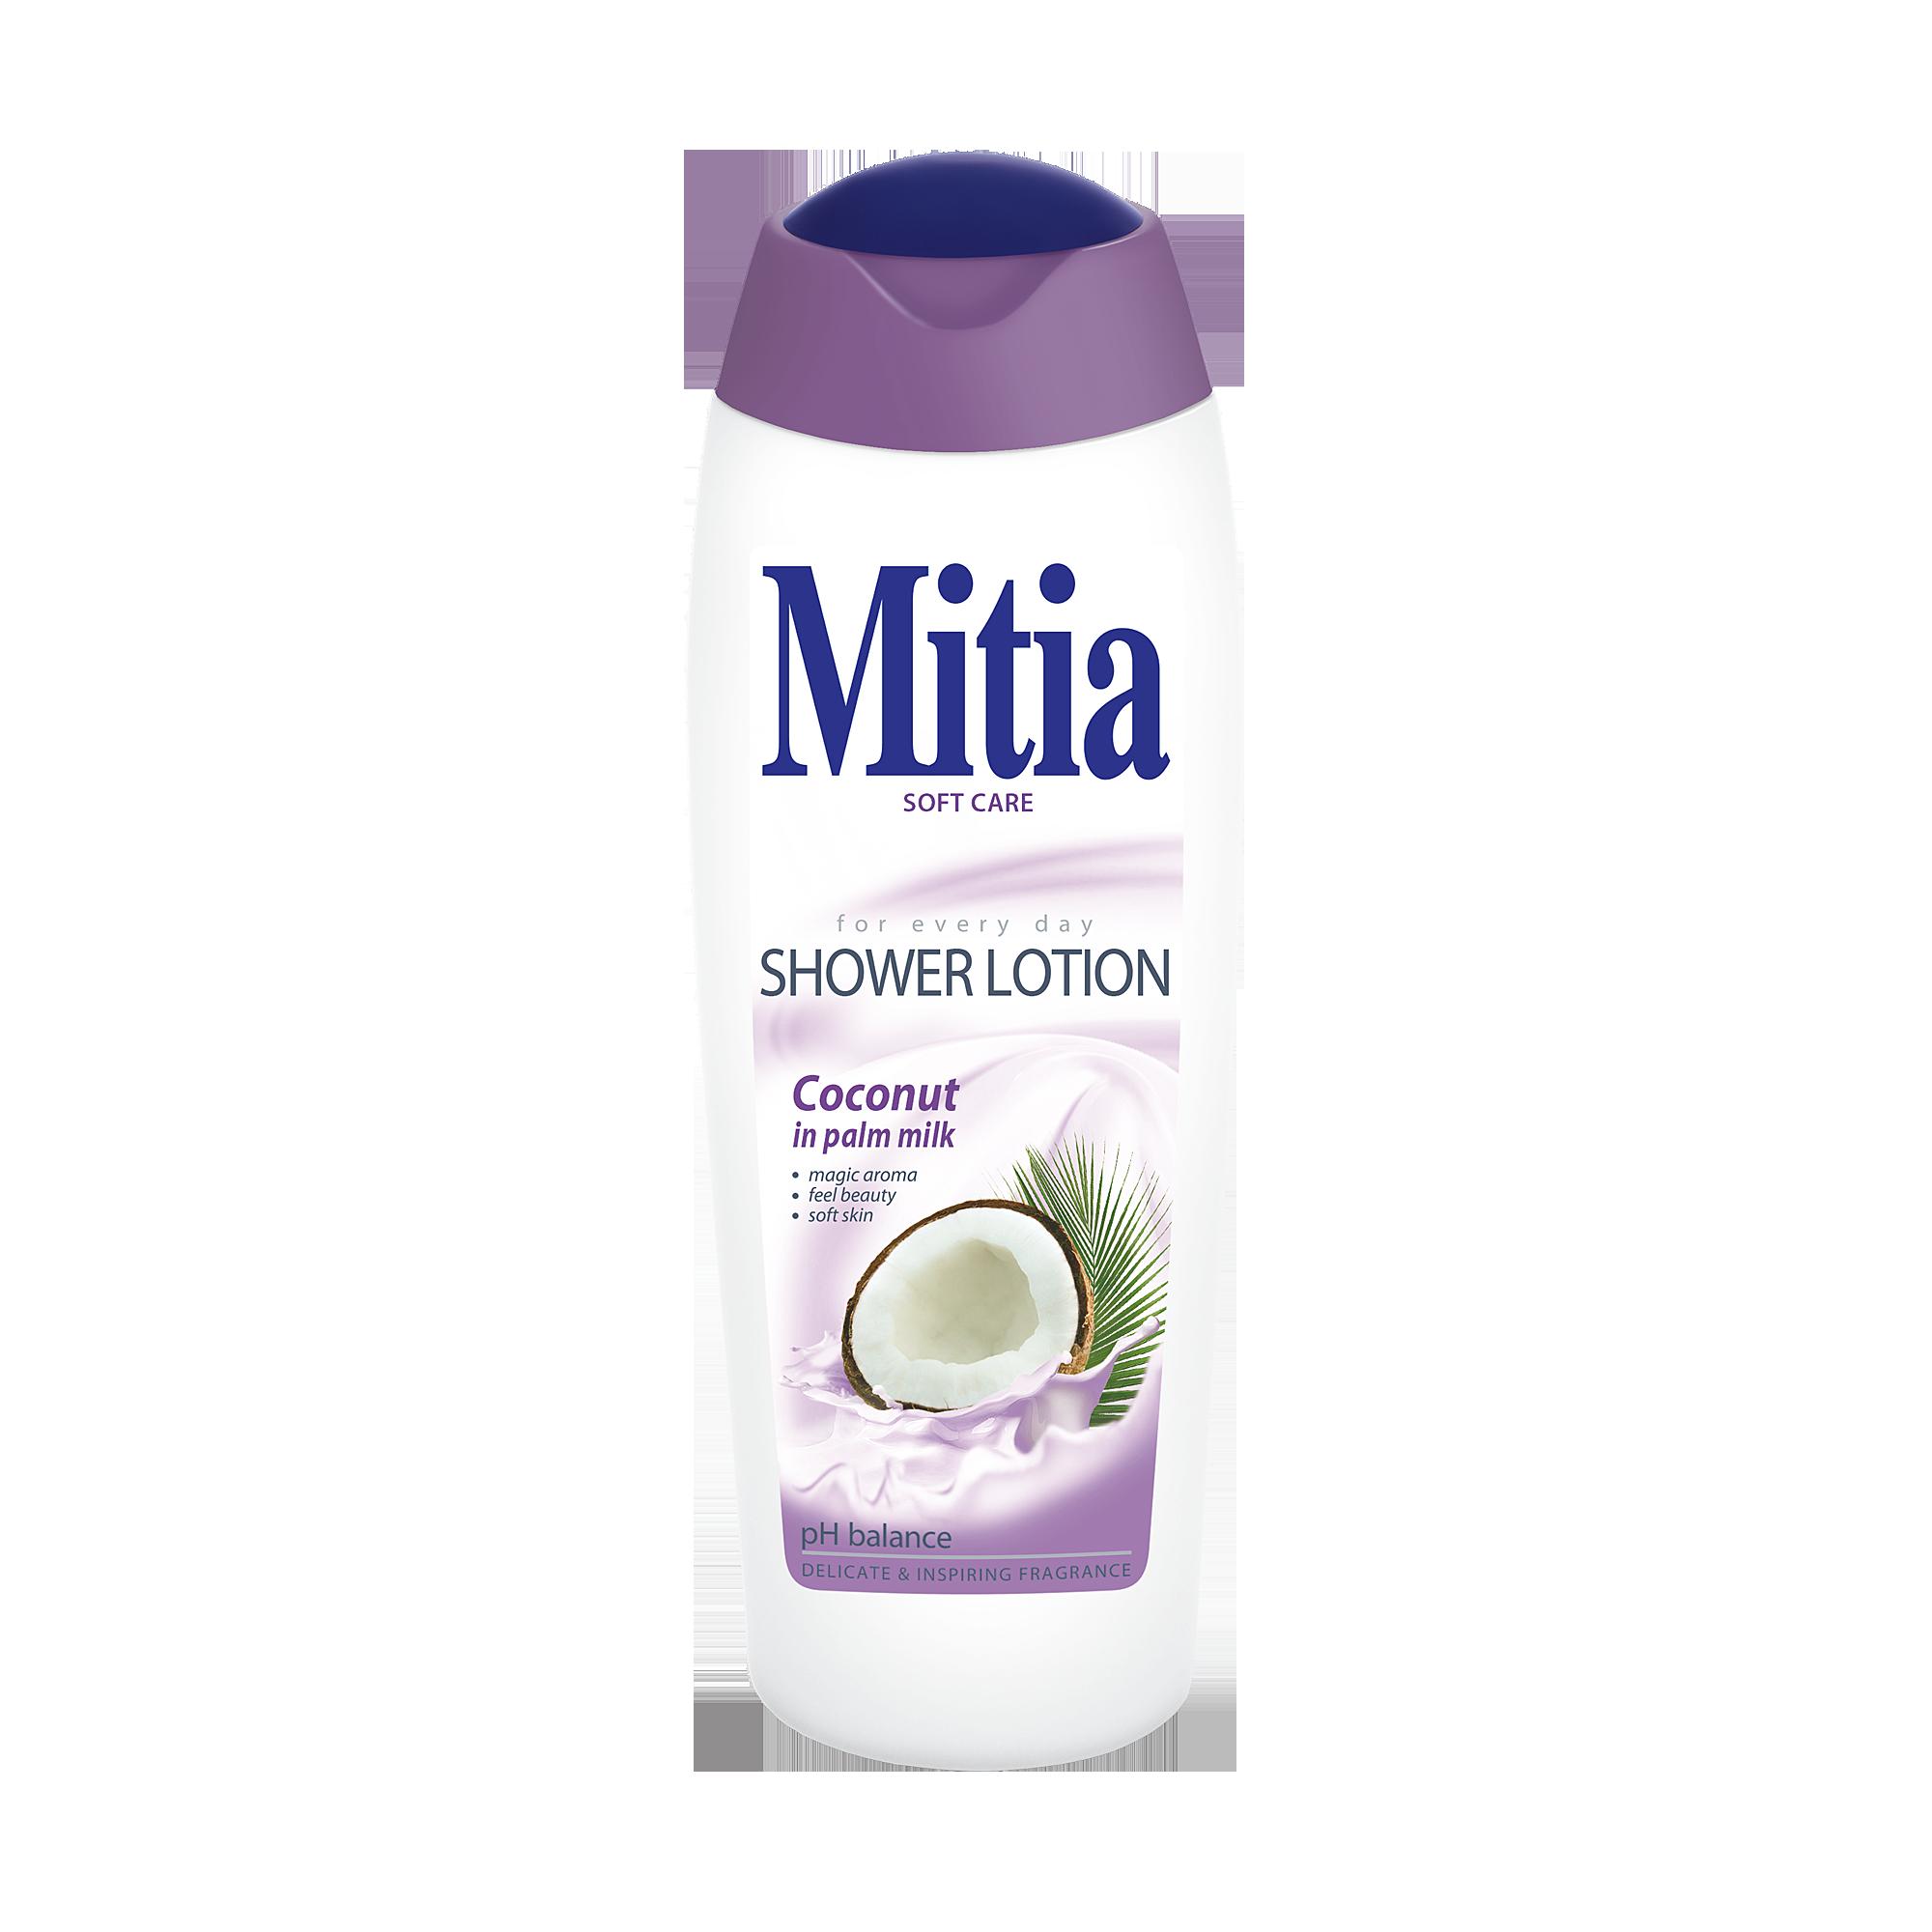 Mitia sprchové mléko Coconut in palm milk